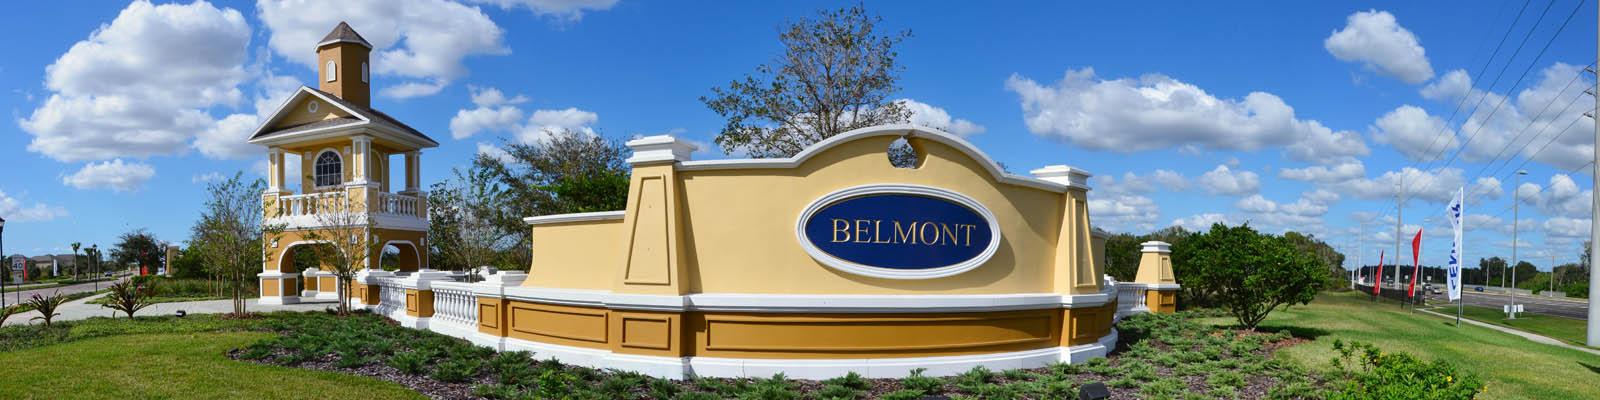 Belmont community, located in Hillsborough County, FL